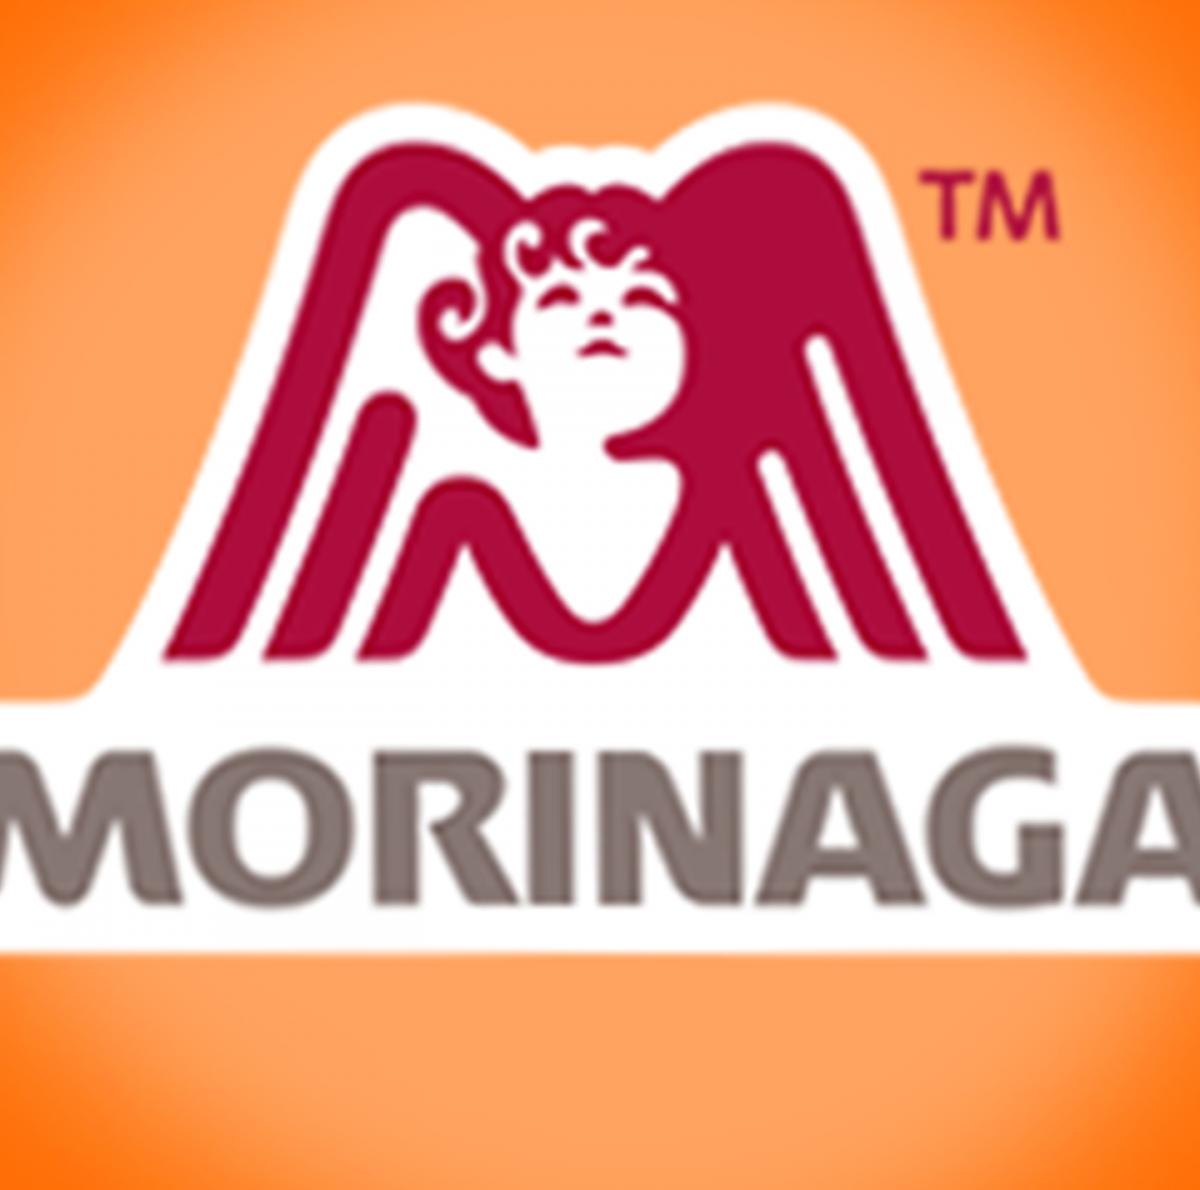 Morinaga 2008